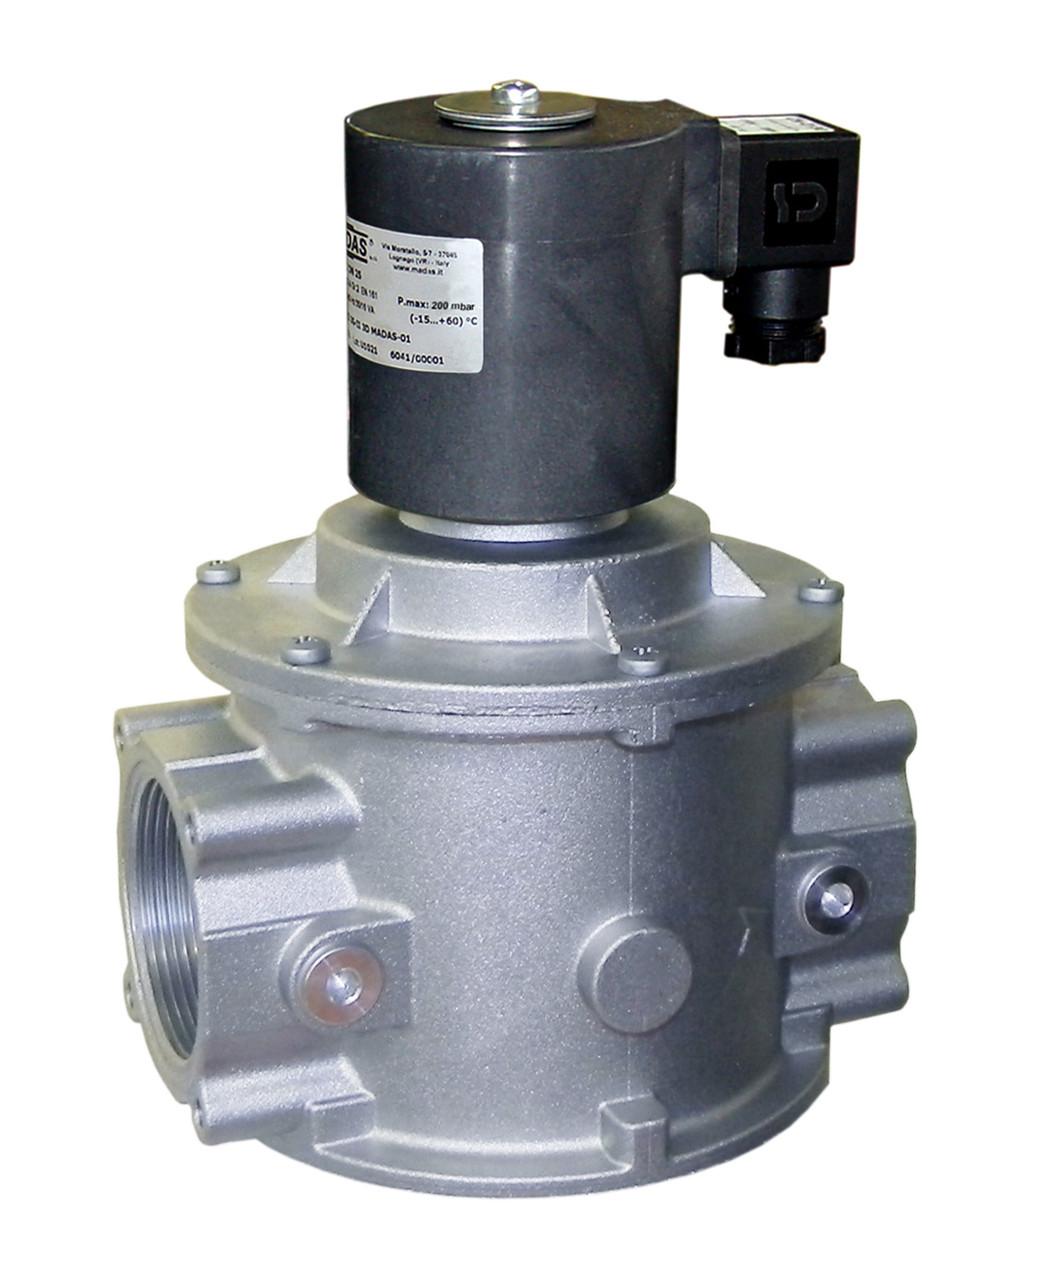 Электромагнитный клапан EV-1, DN50, P=1 bar (MADAS)